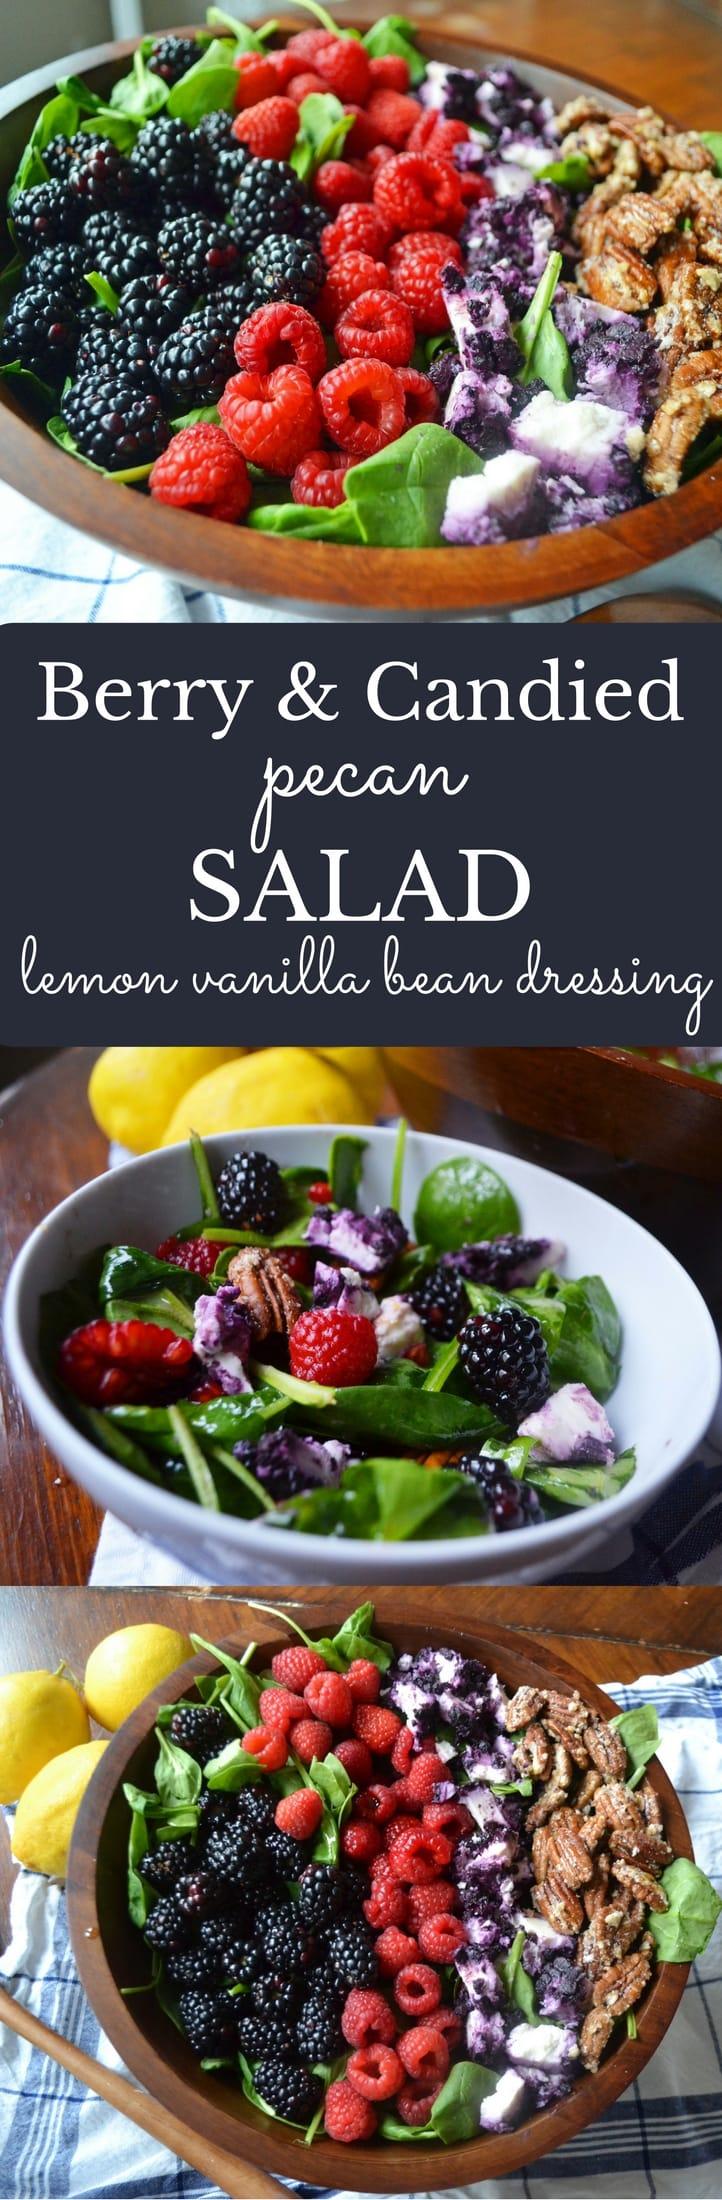 Berry Candied Pecan Salad with Lemon Vanilla Bean Dressing by Modern Honey -- www.modernhoney.com